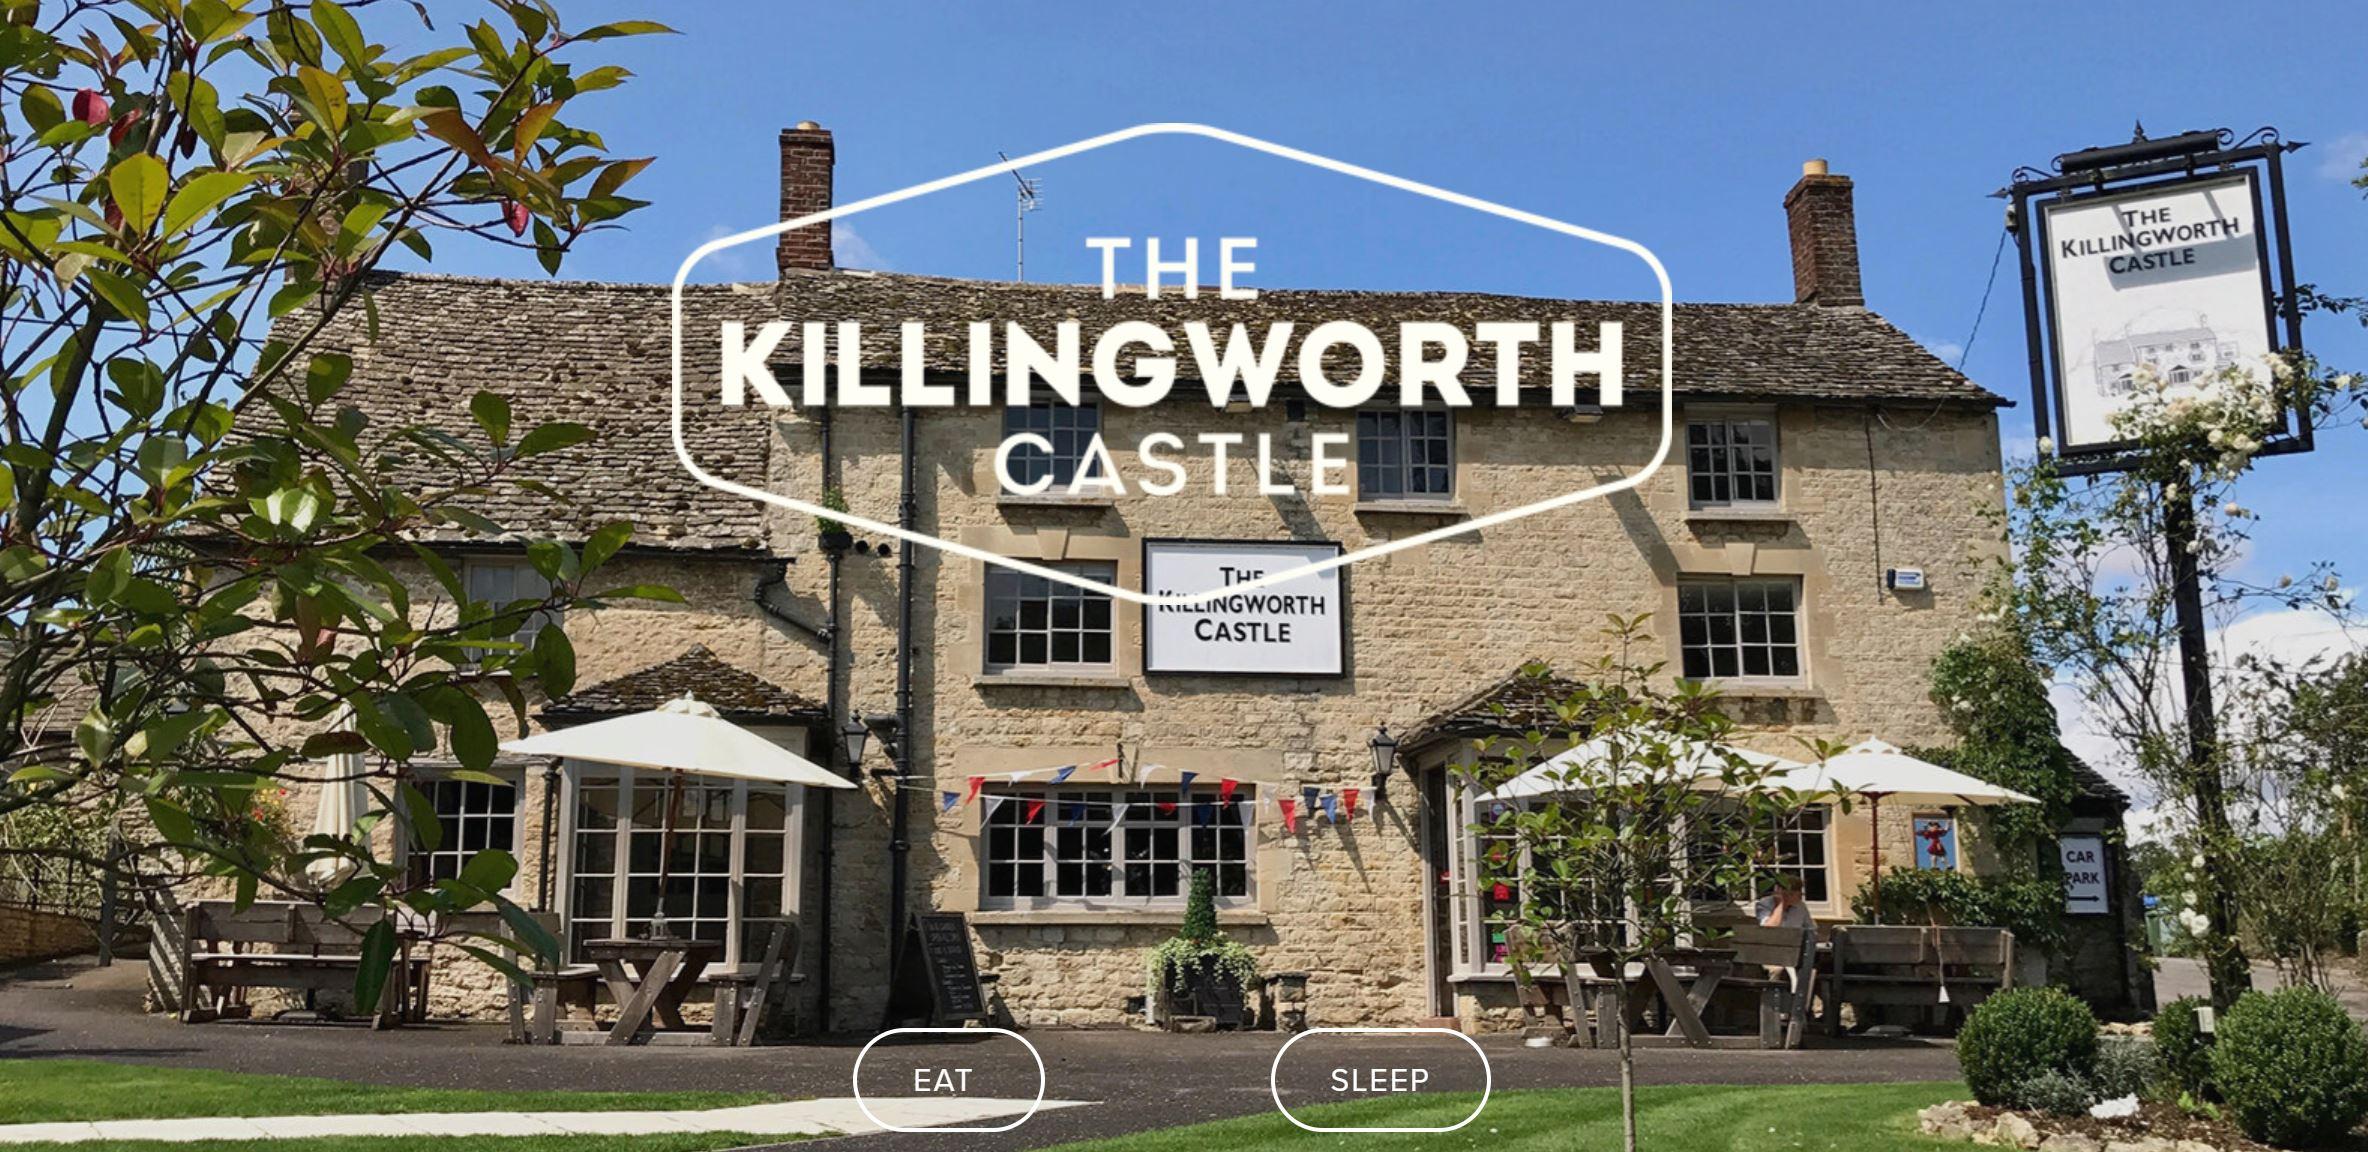 Killingworth Castle image